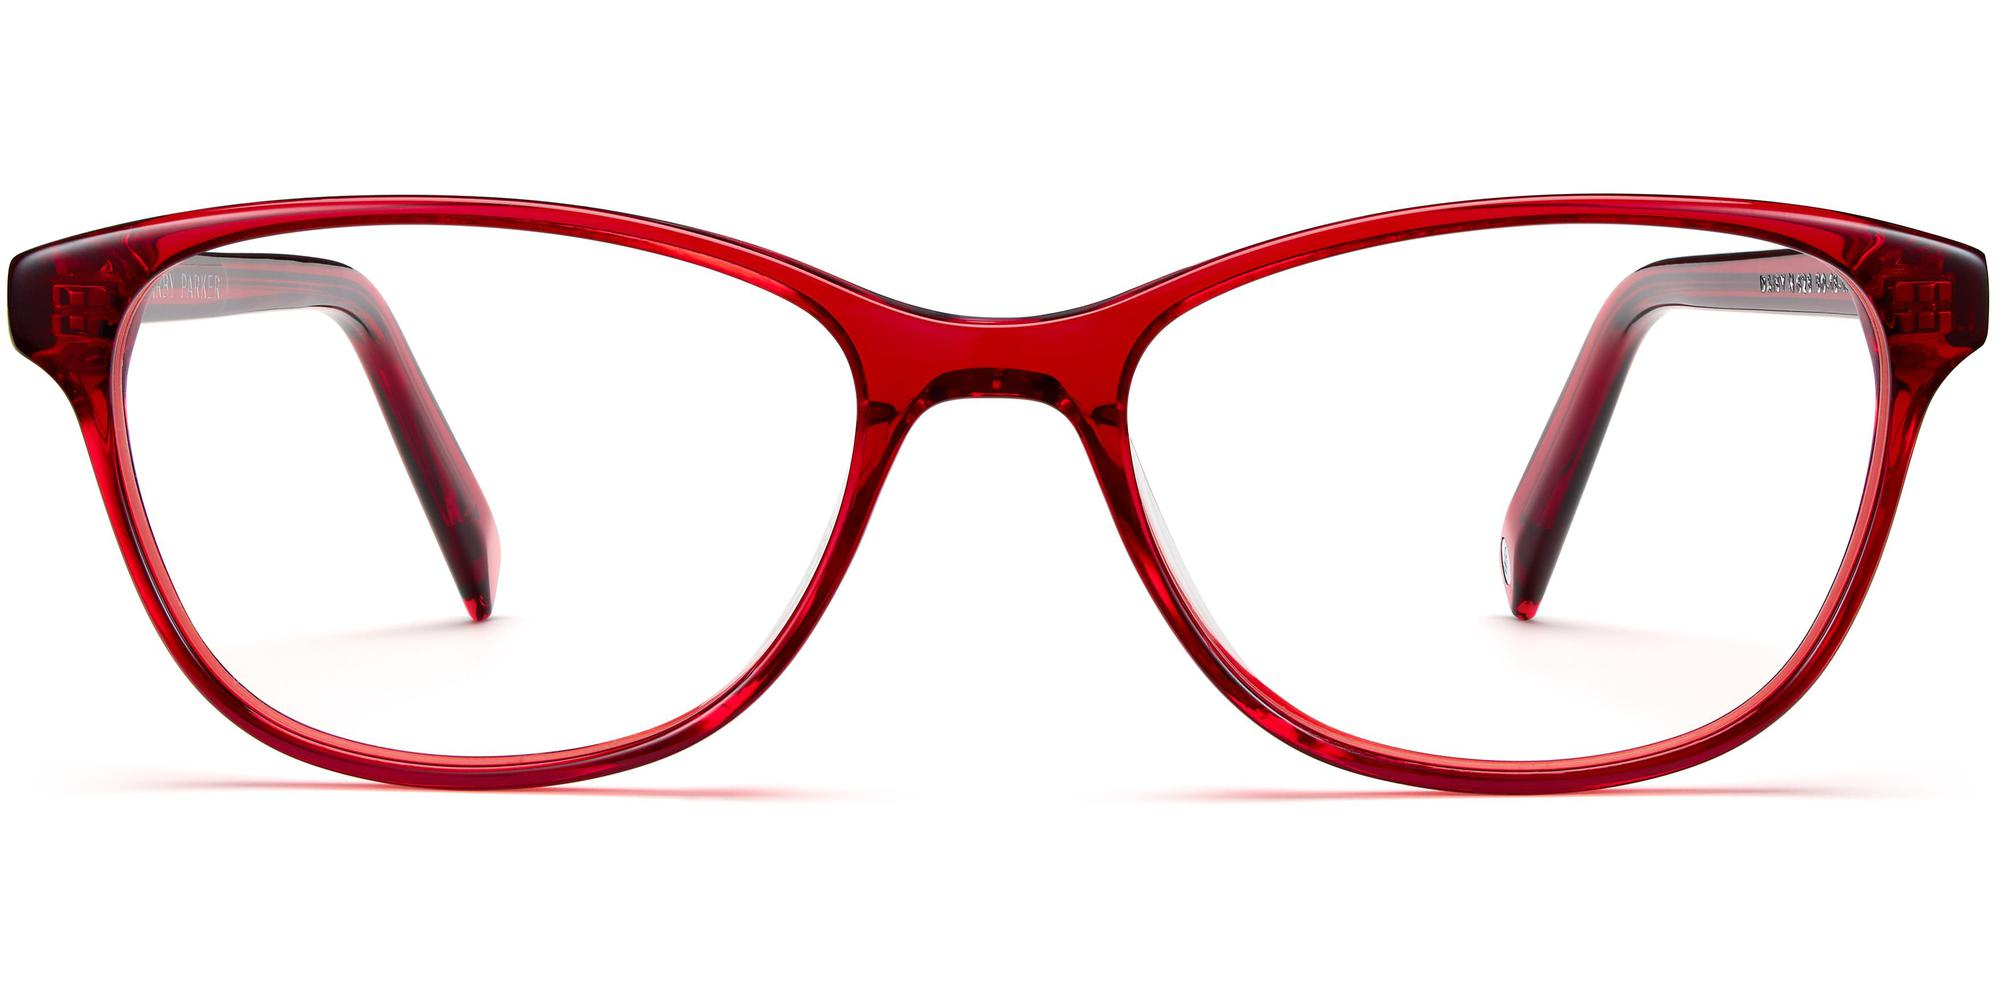 Daisy f eyeglasses in Cardinal Crystal (Rx)